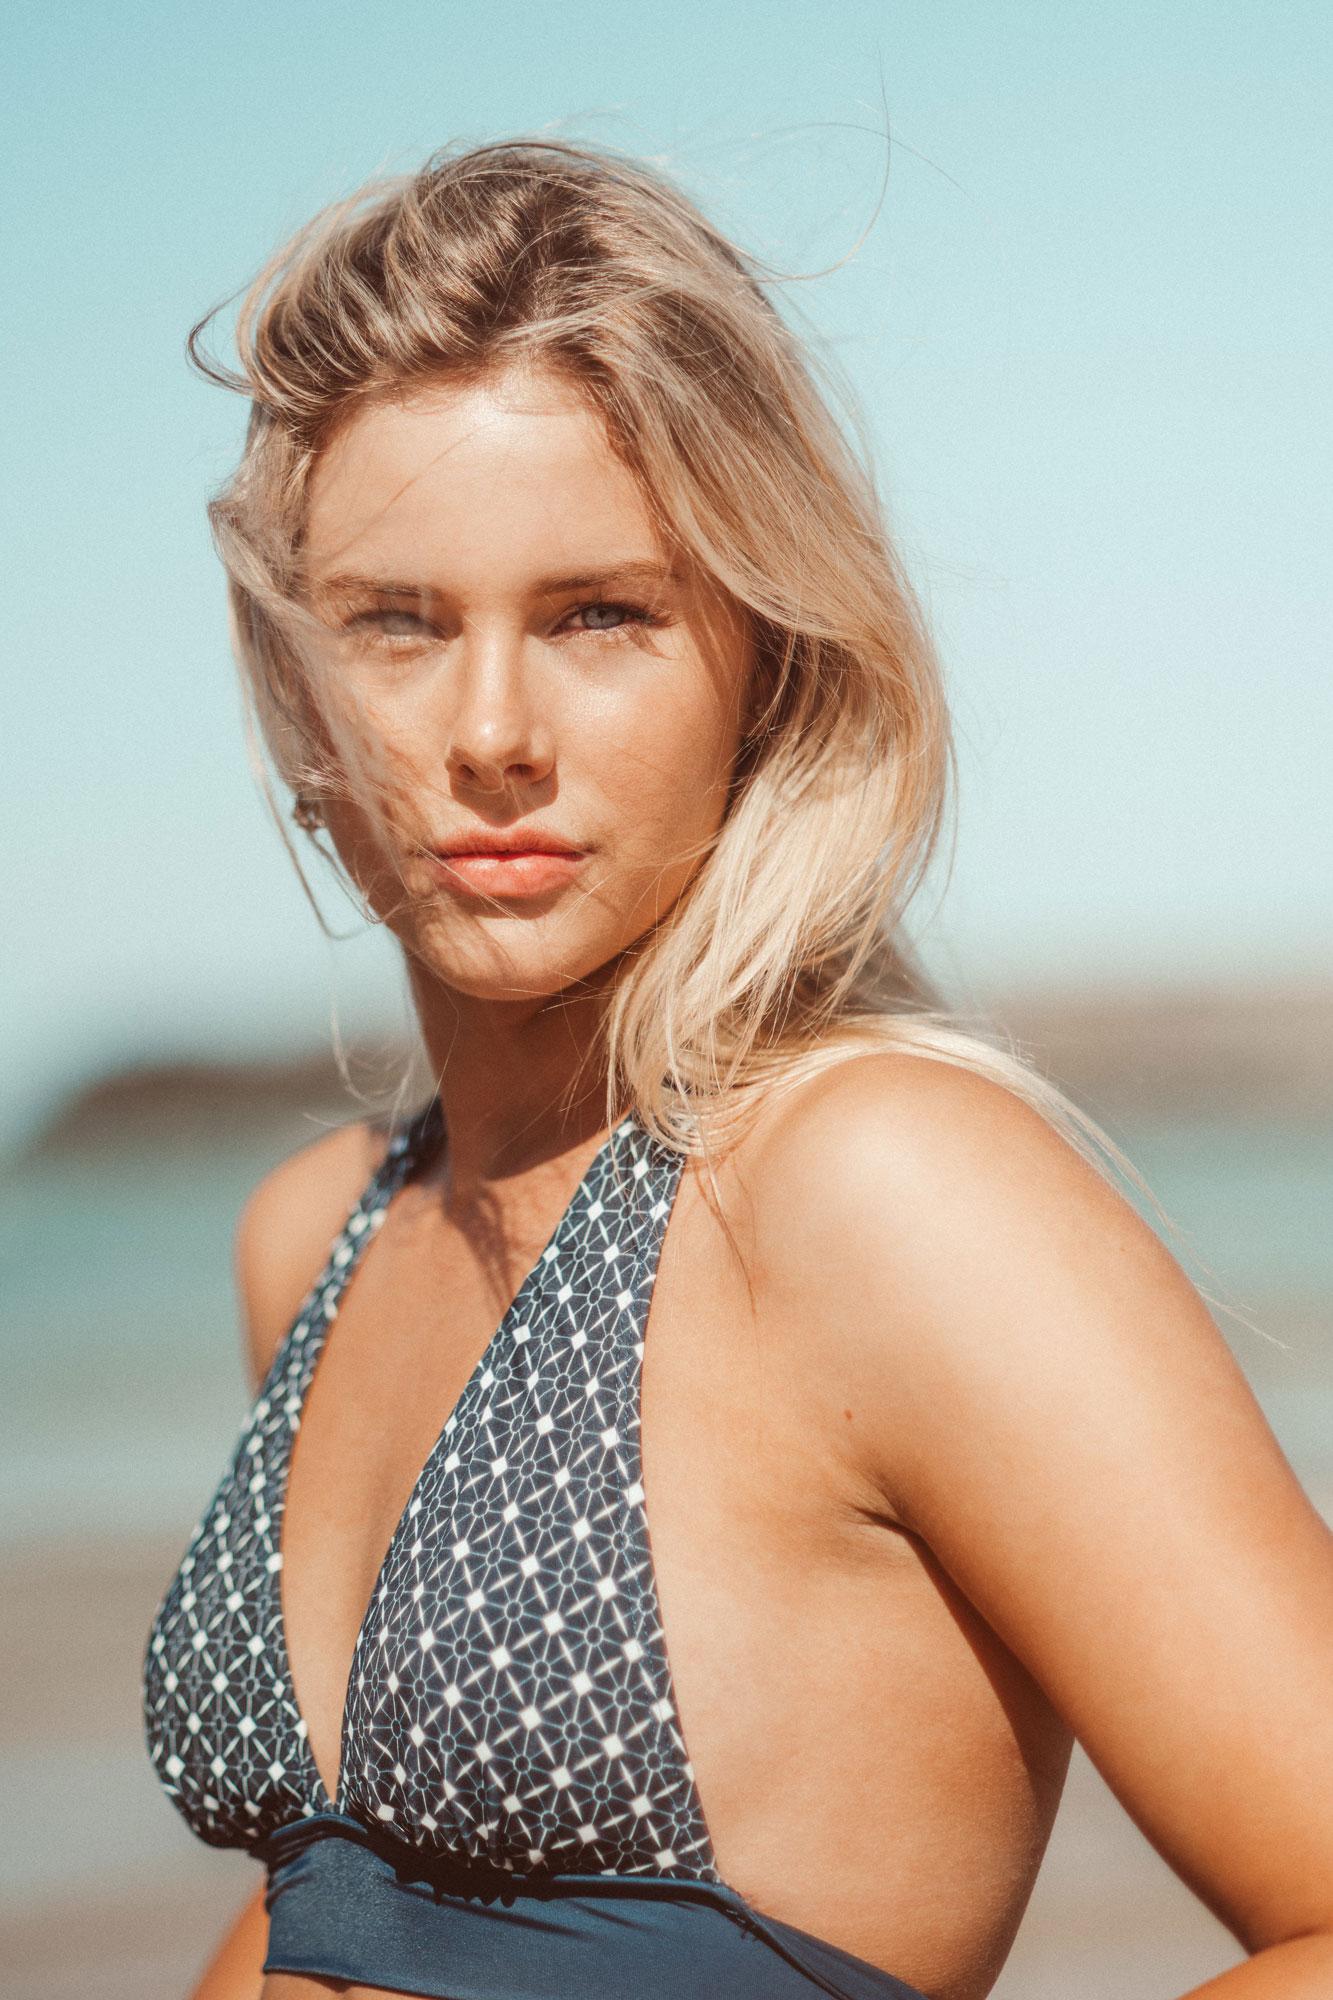 Lily-Goodare-Gold-Coast-Model-by-Photographer-Kim-Akrigg-.jpg